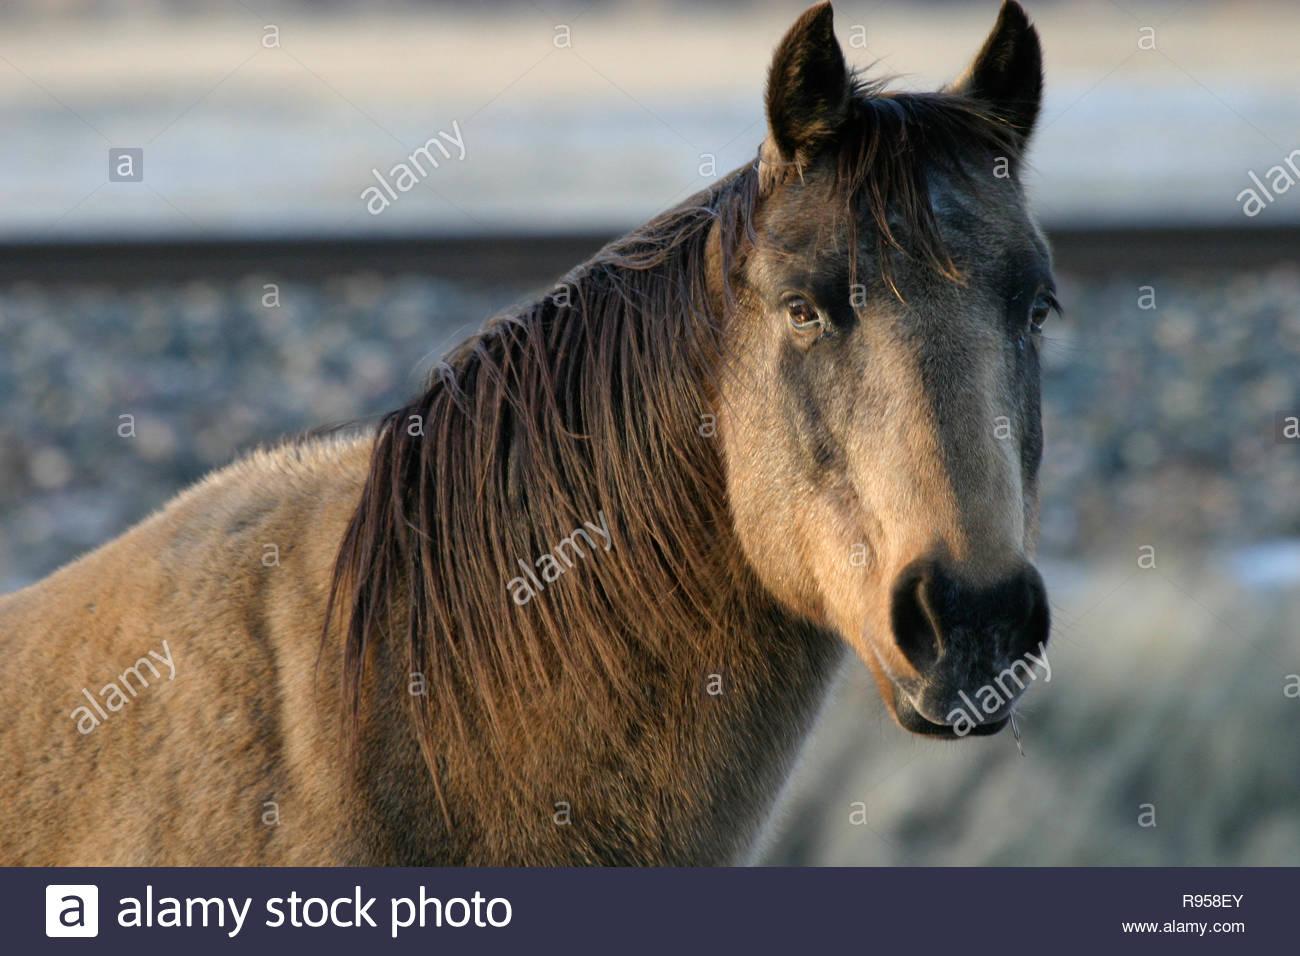 Horse, Livingston, Montana, USA - Stock Image